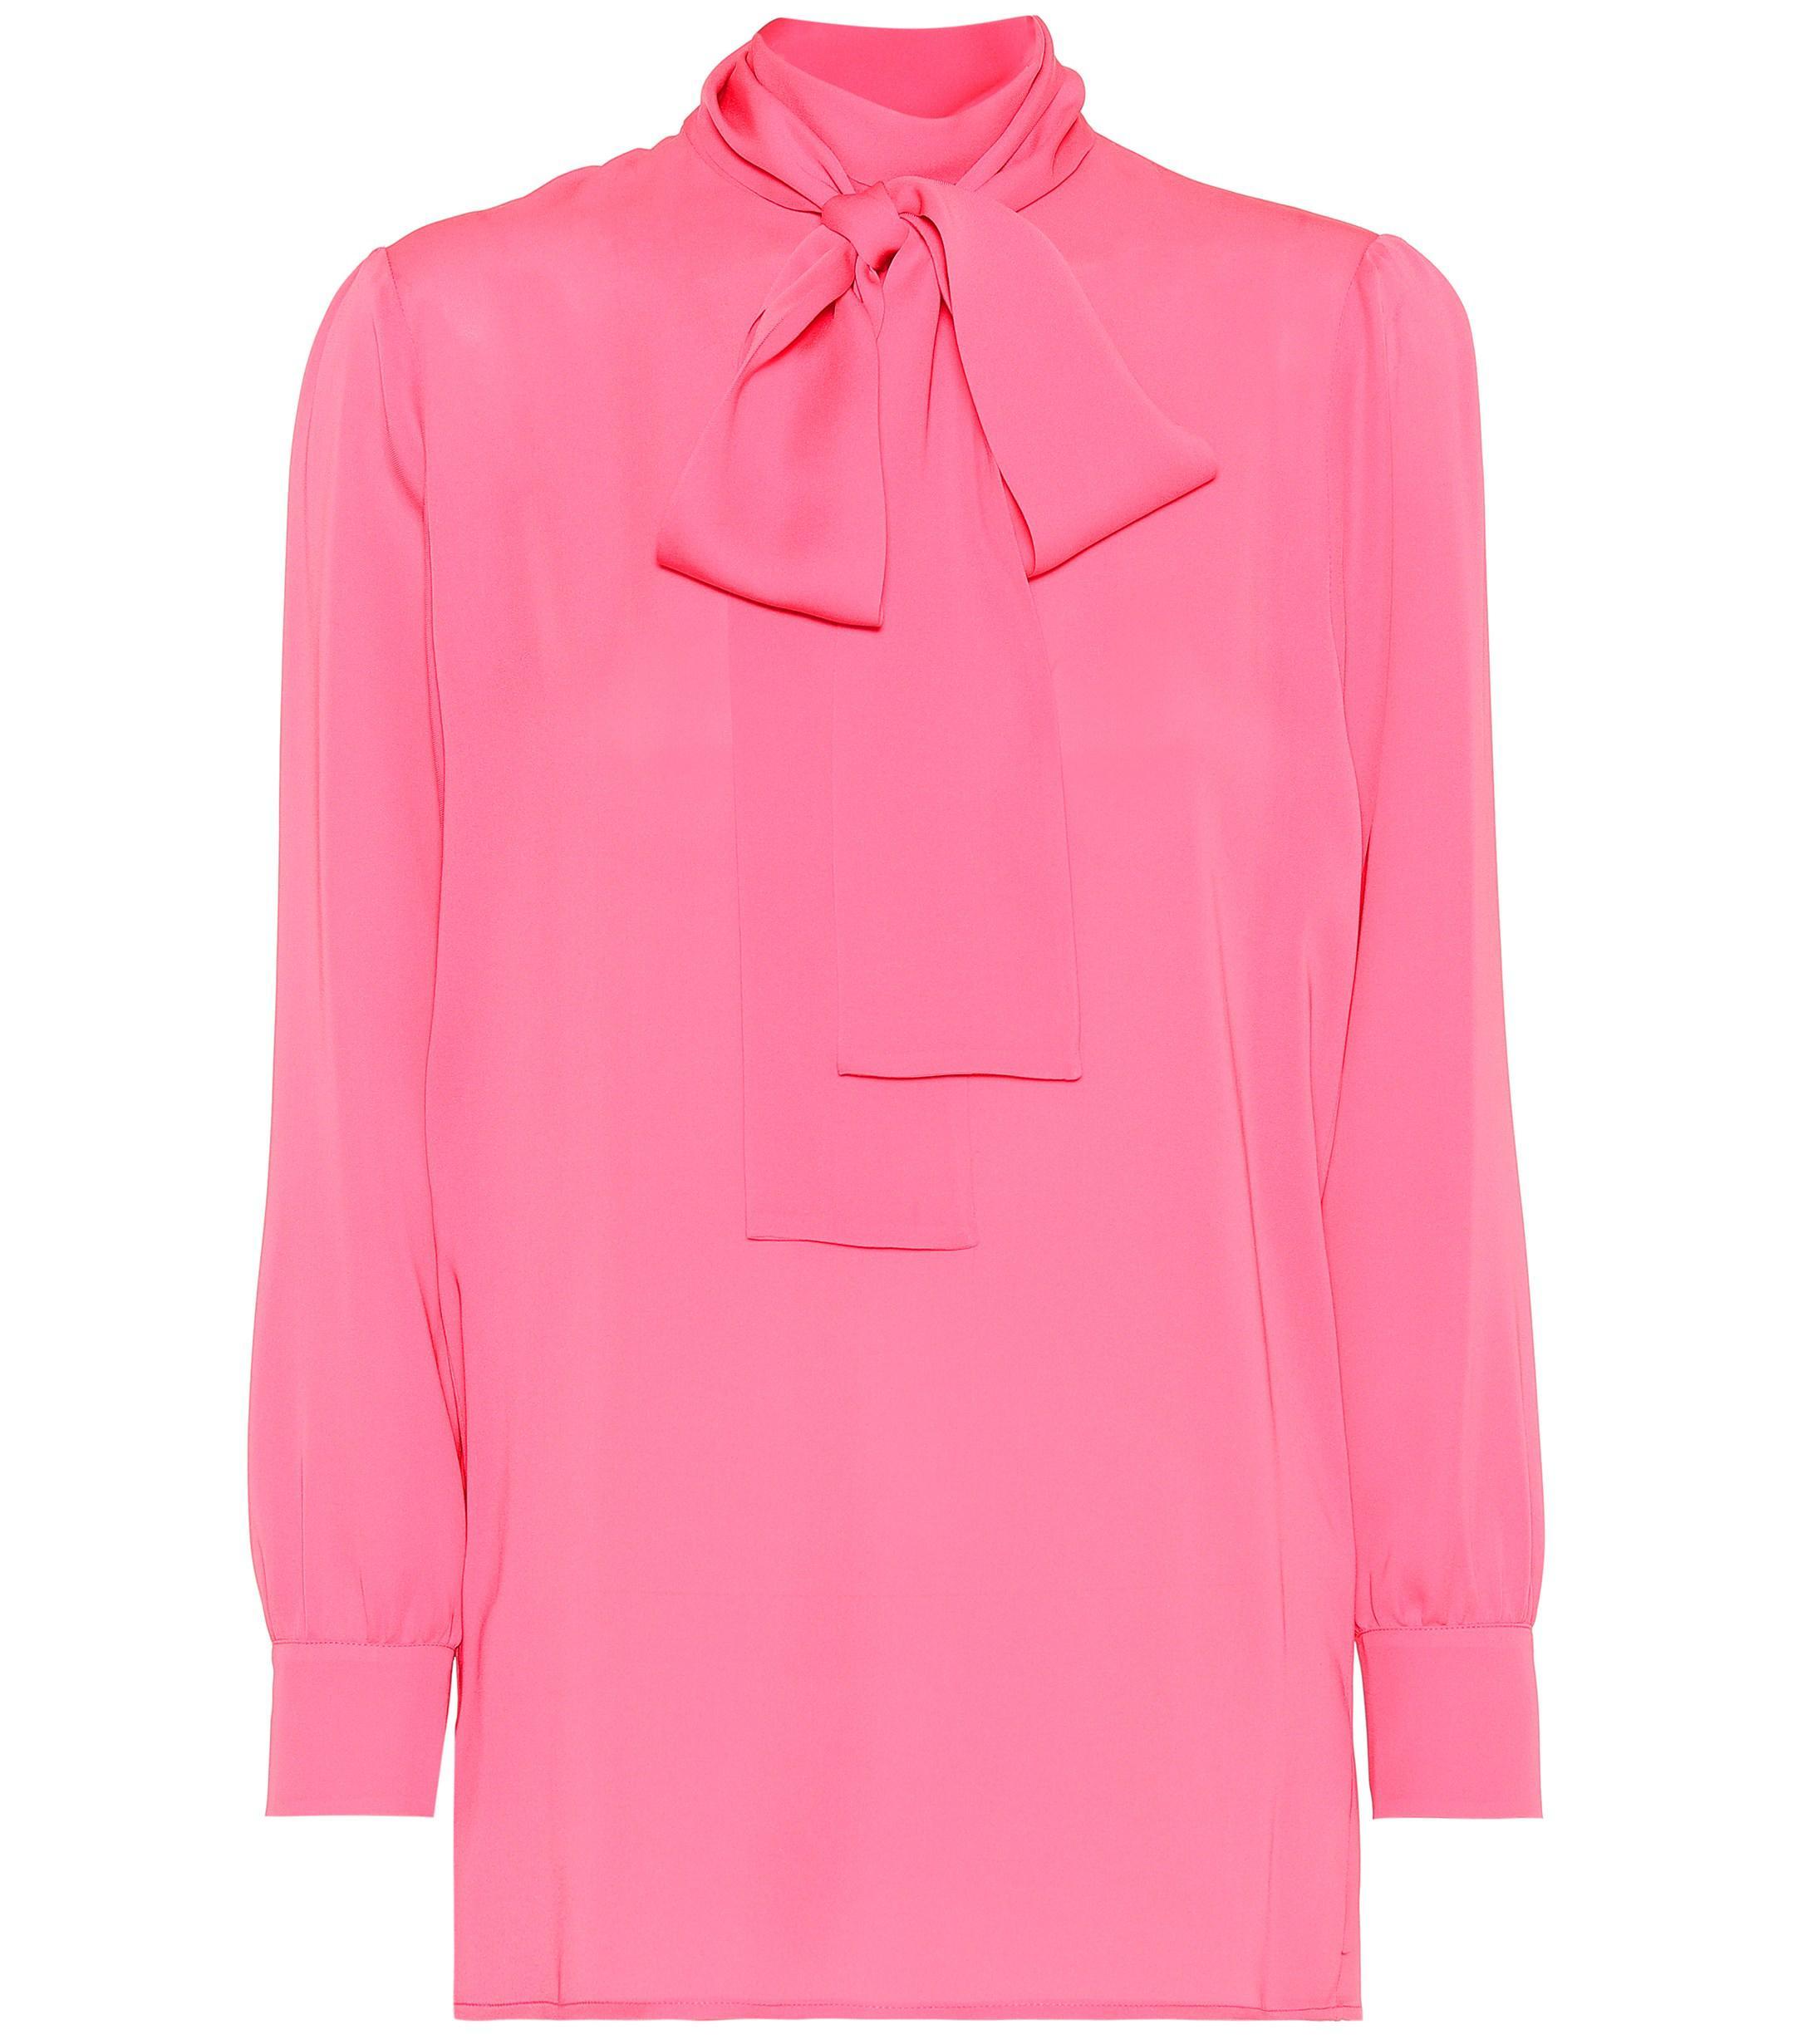 b34482ce5 Lyst - Gucci Silk Georgette Blouse in Pink